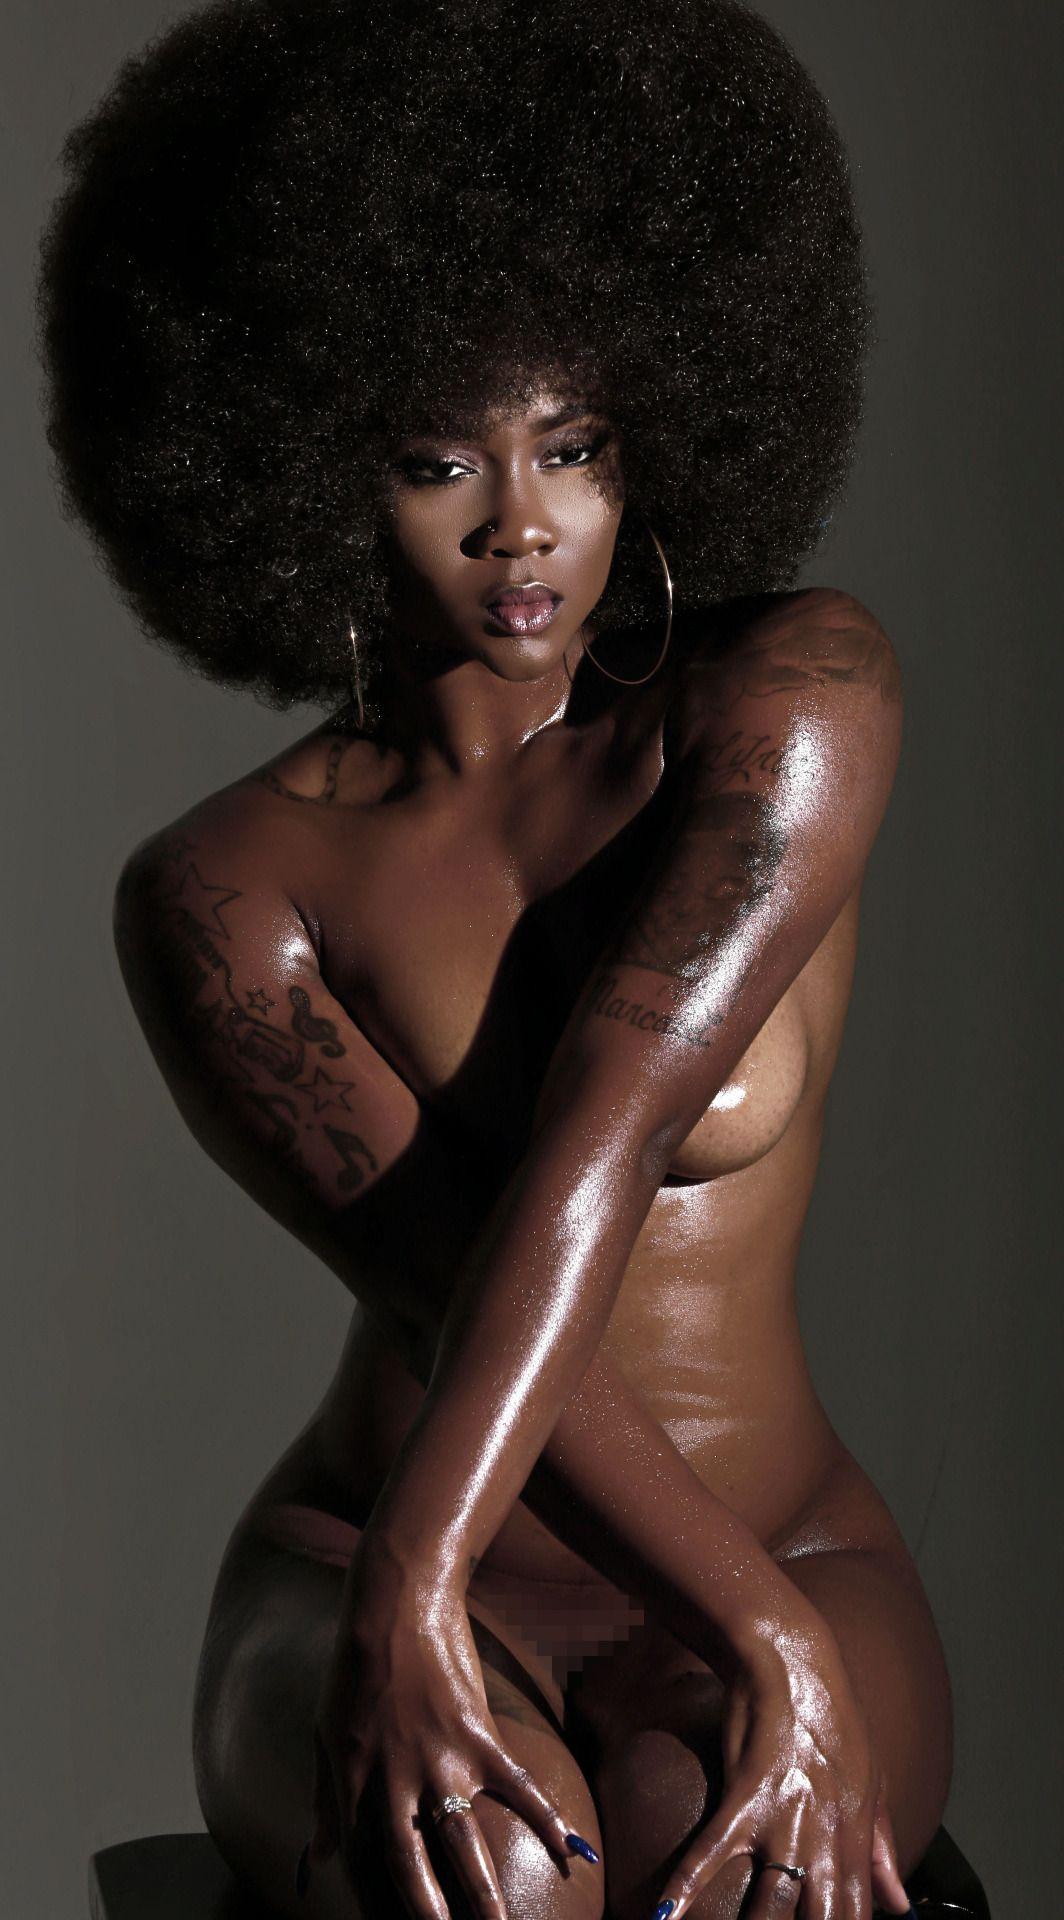 Rasta Style Flower Child  Ebony  Beautiful Black Women -1673